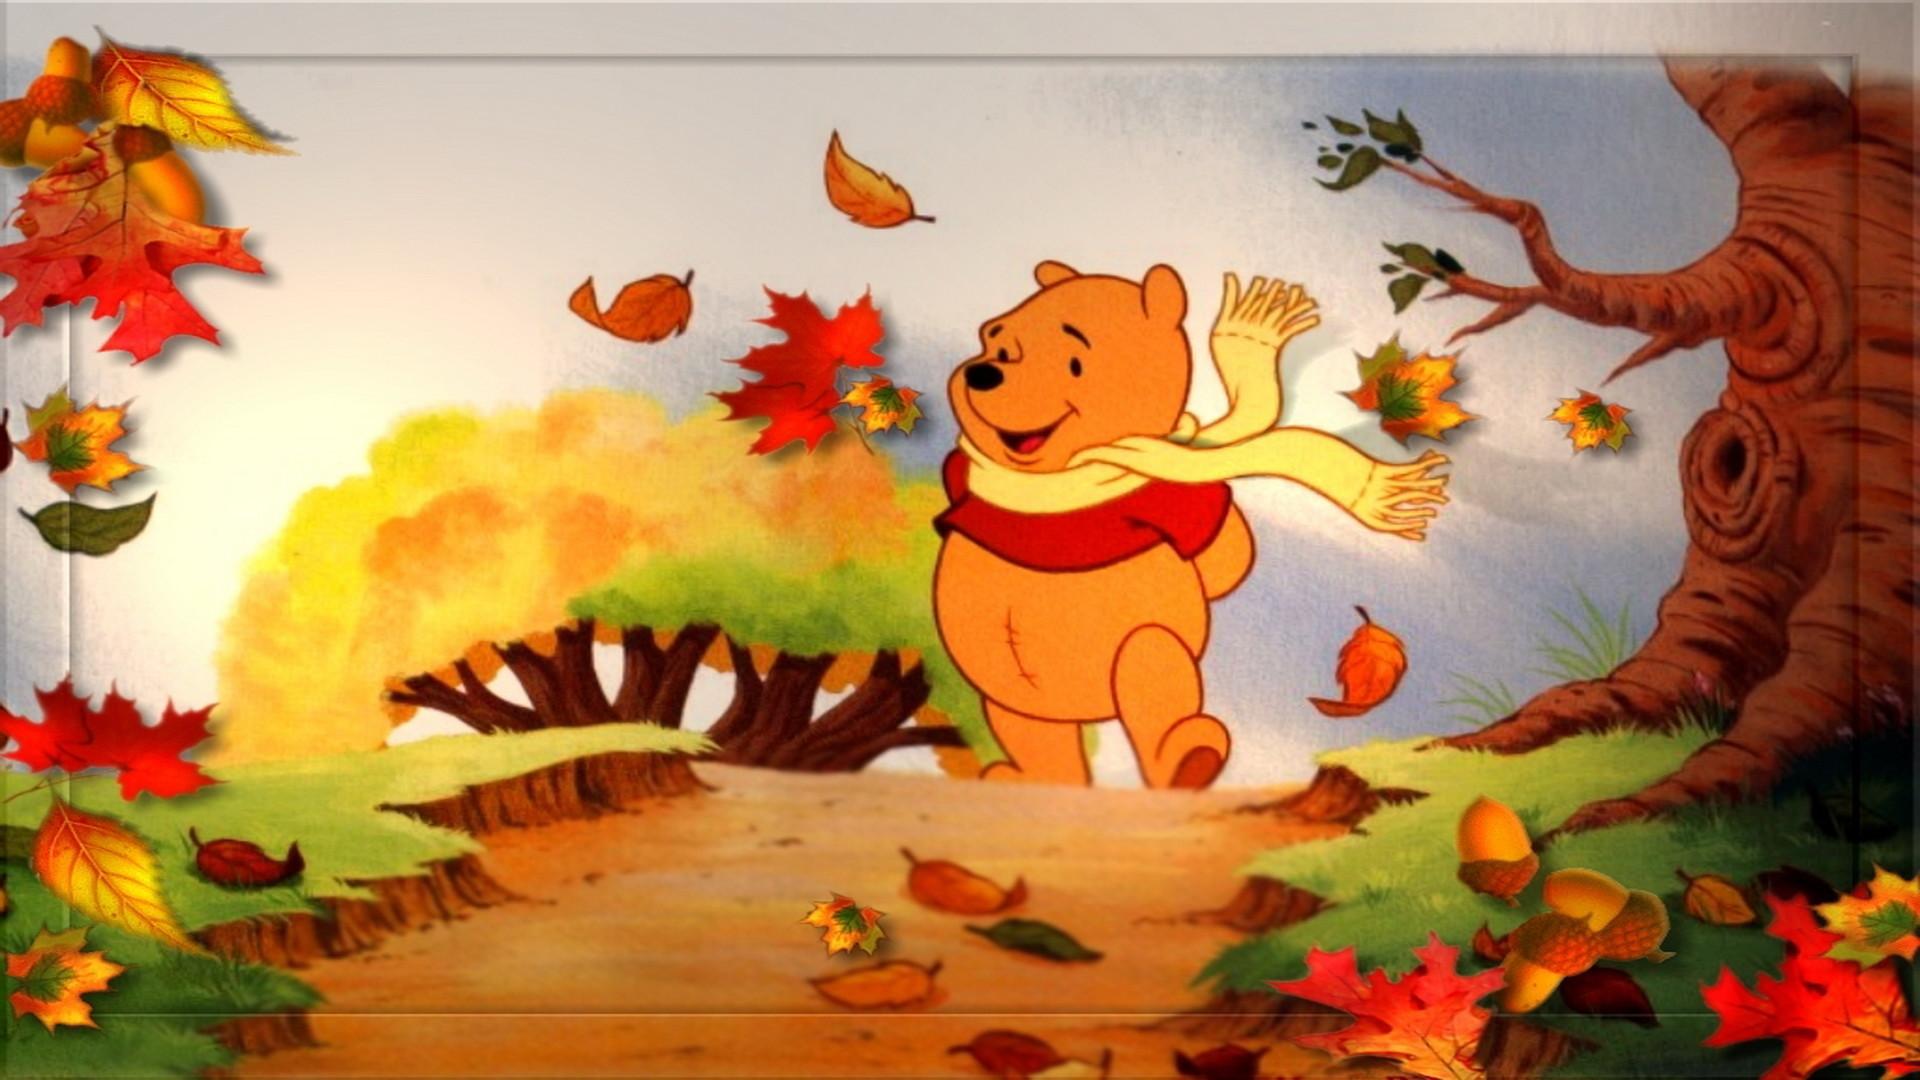 Res: 1920x1080, Disney Thanksgiving Wallpaper